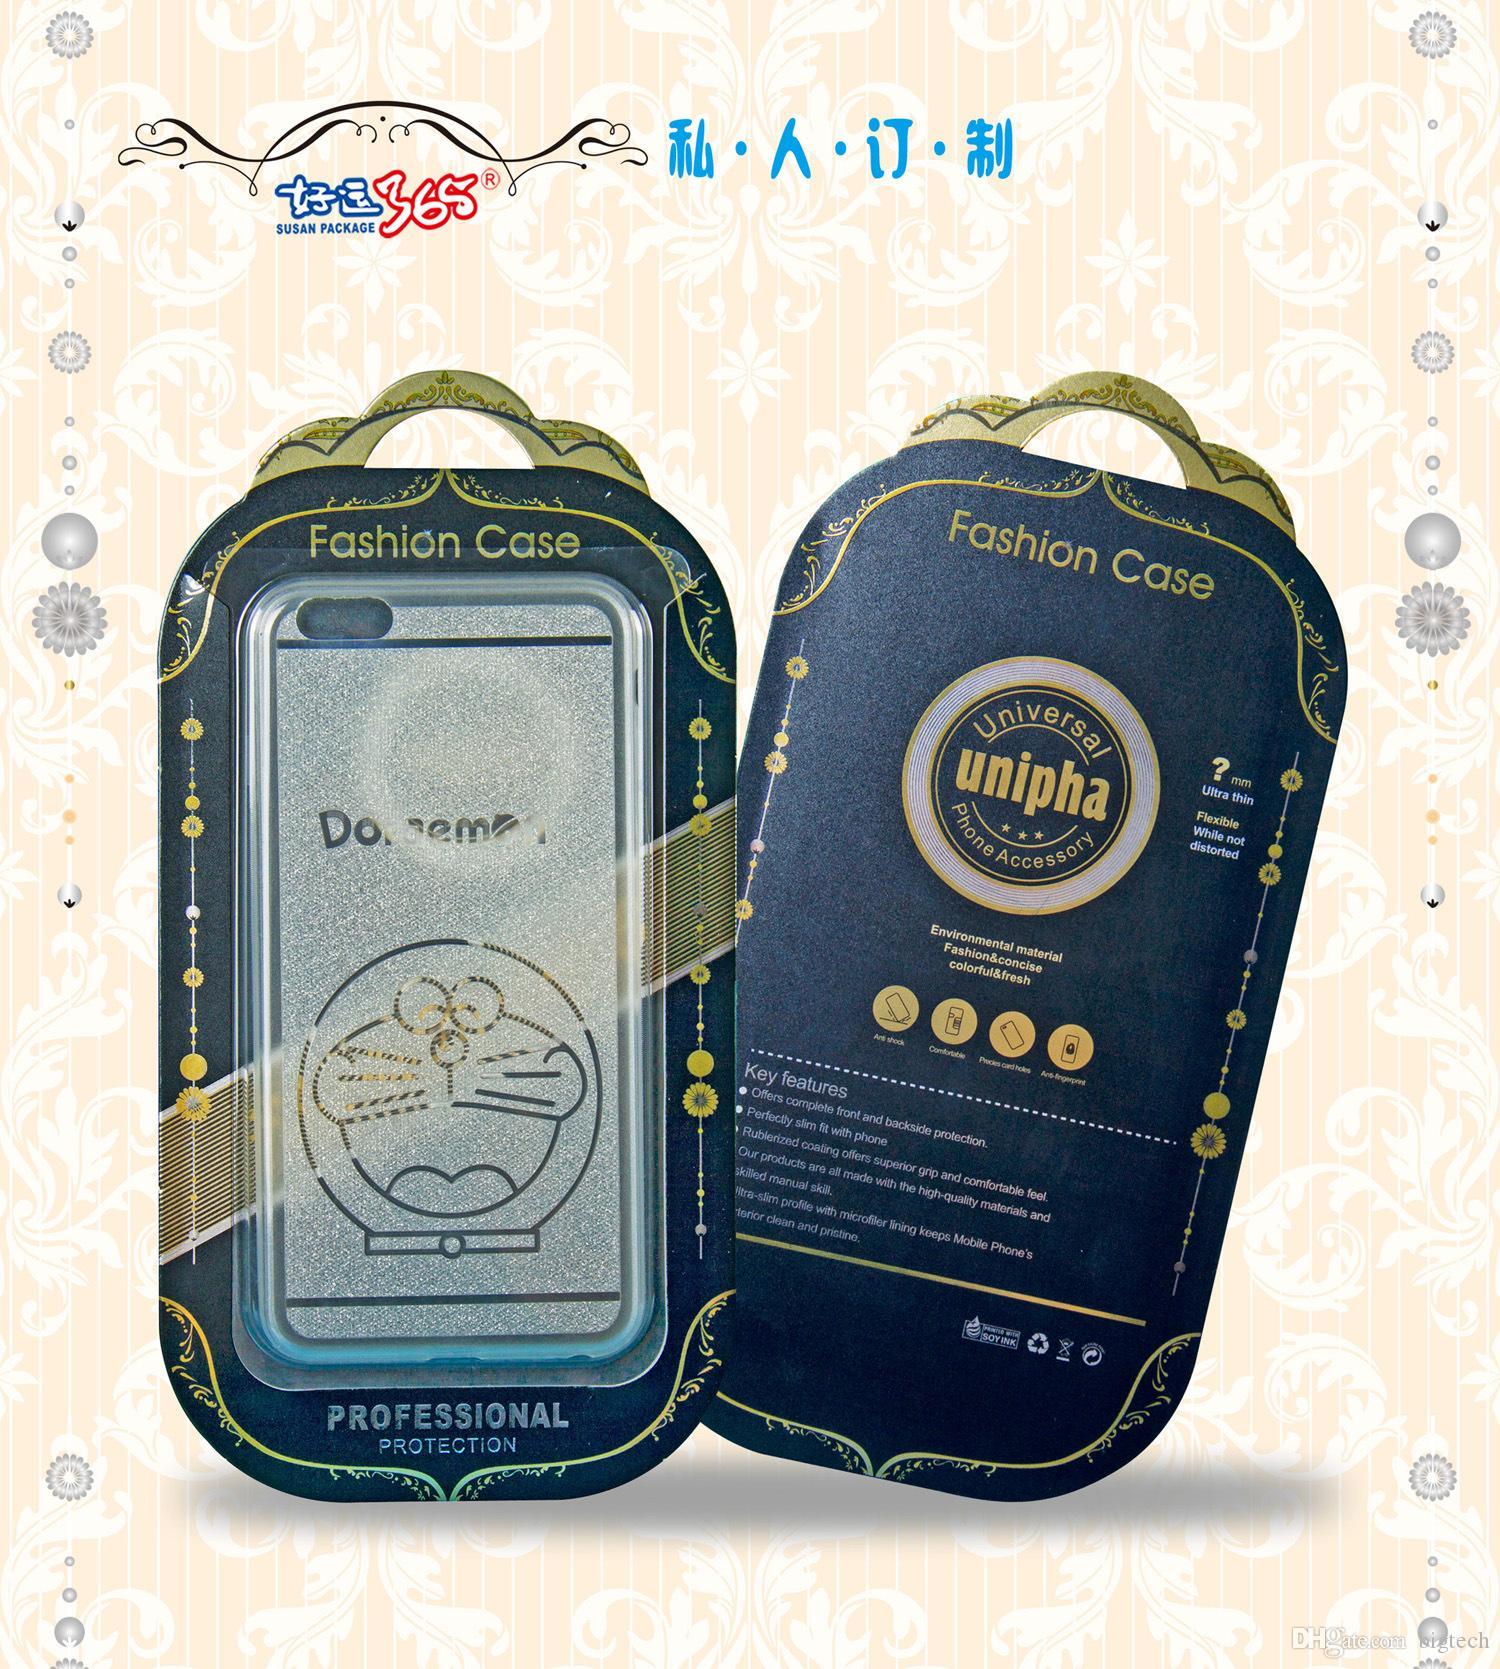 500pcs 아이폰에 대 한 강화 유리 화면 보호기에 대 한 지우기 창 패키지와 고급 골 판지 삼성 전자 HTC LG 포장 상자